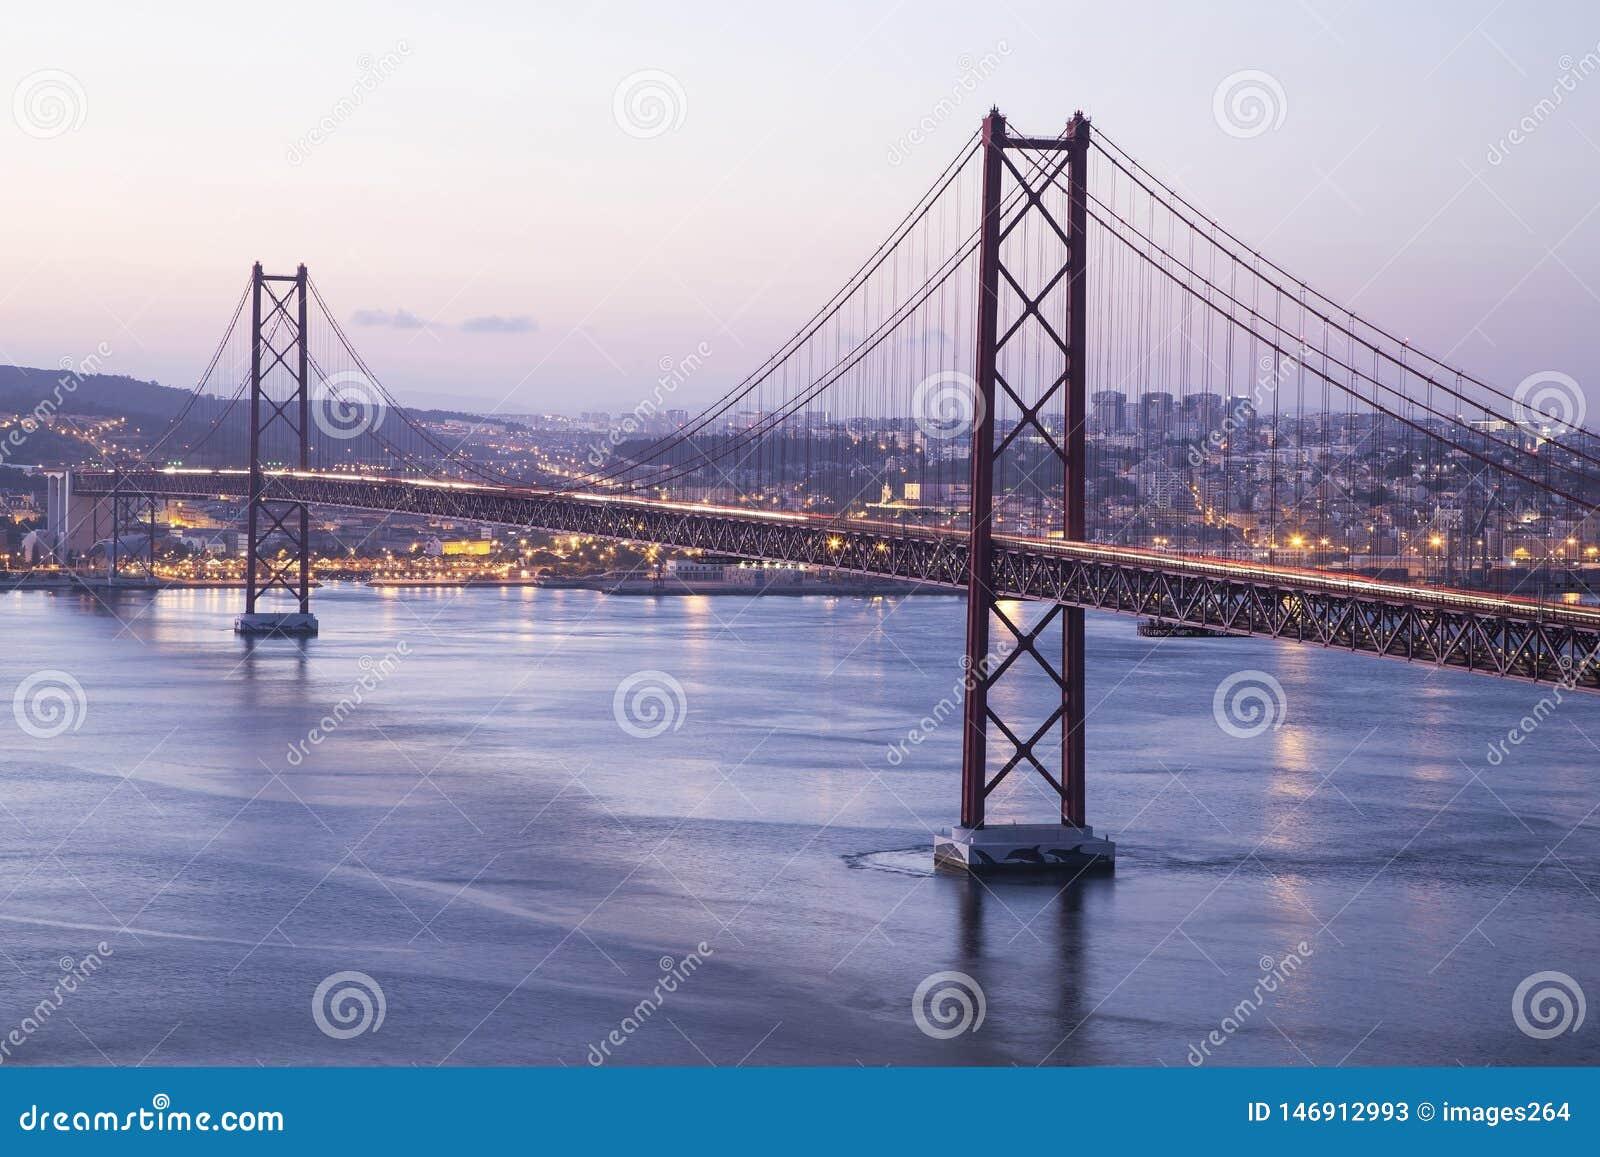 Rote Br?cke in Lissabon